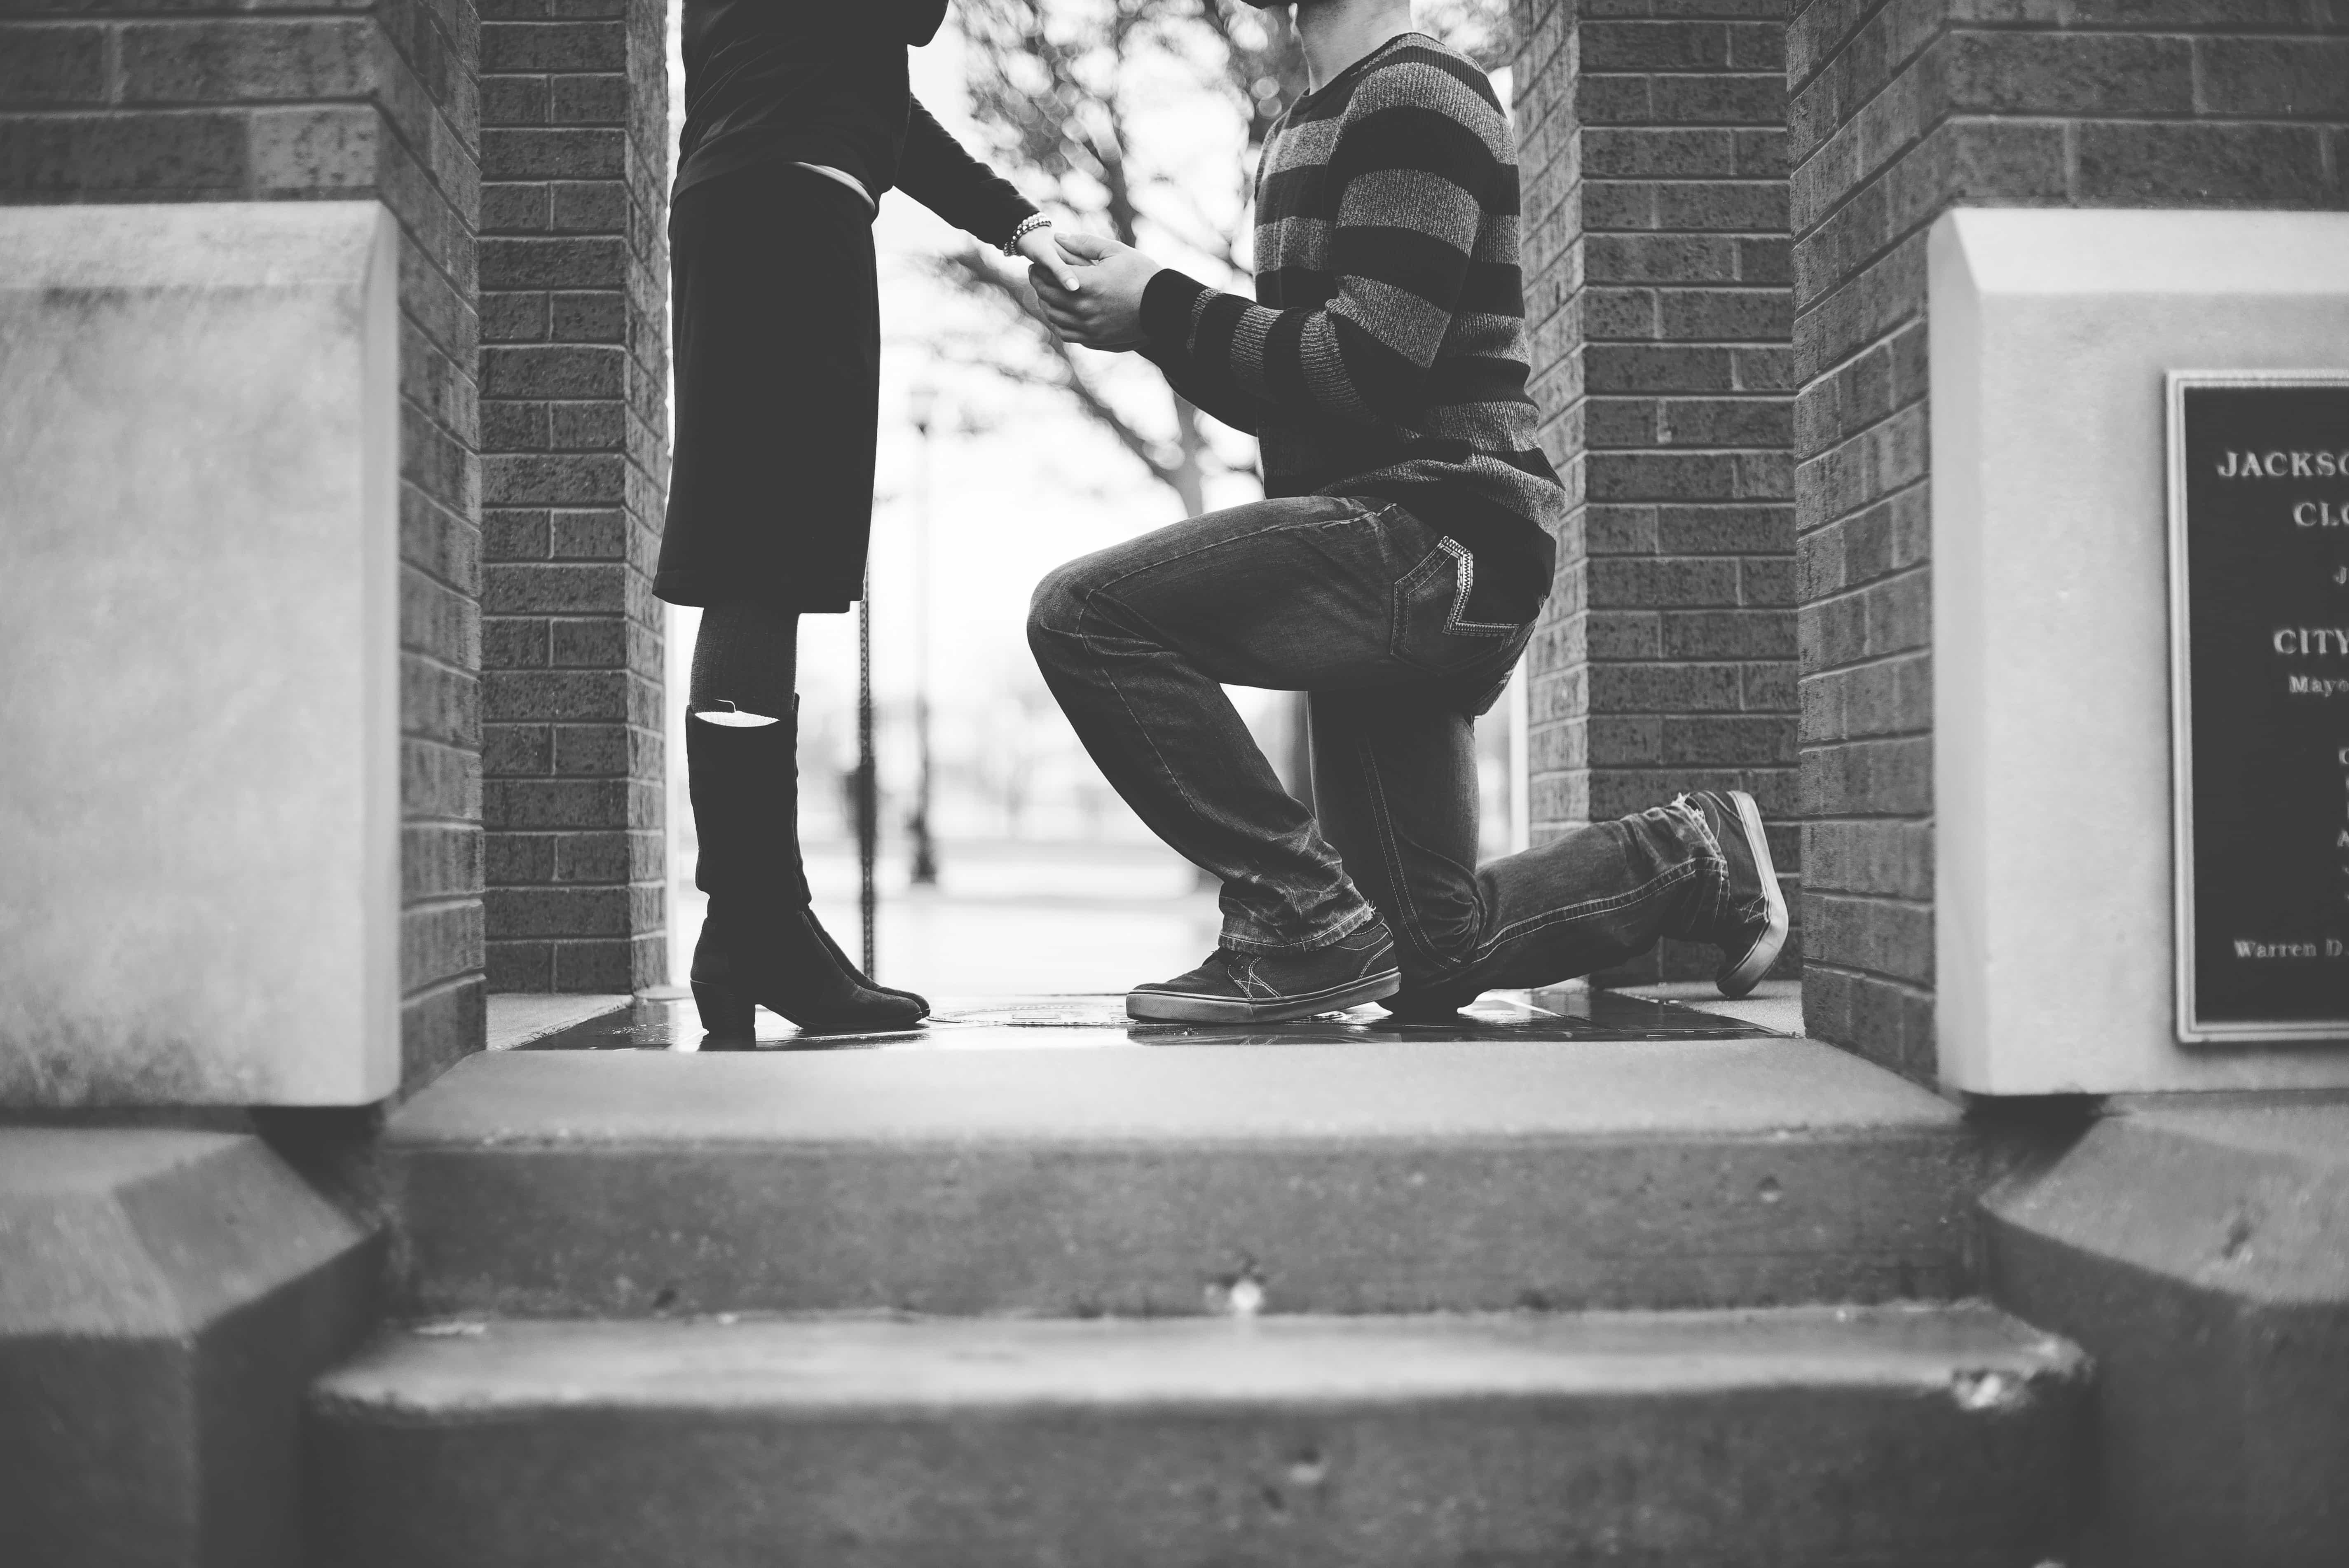 Boyfriend proposing to girlfriend - the proposal